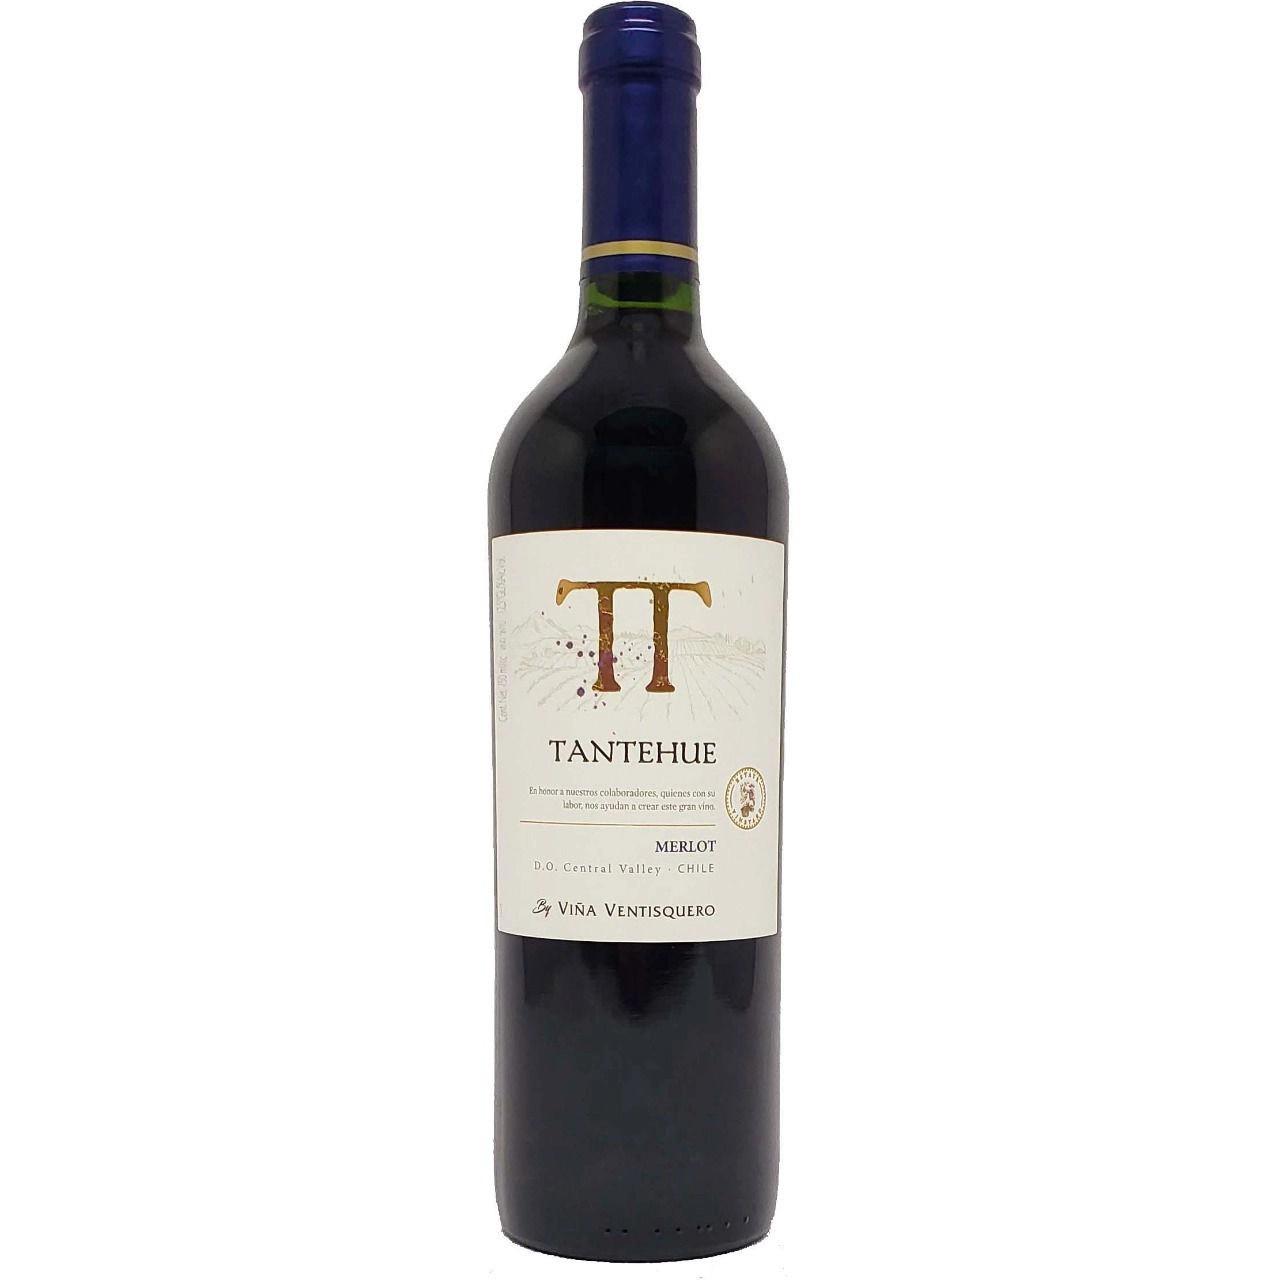 Vinho Tinto Chileno Tantehue Merlot 750ml 2019